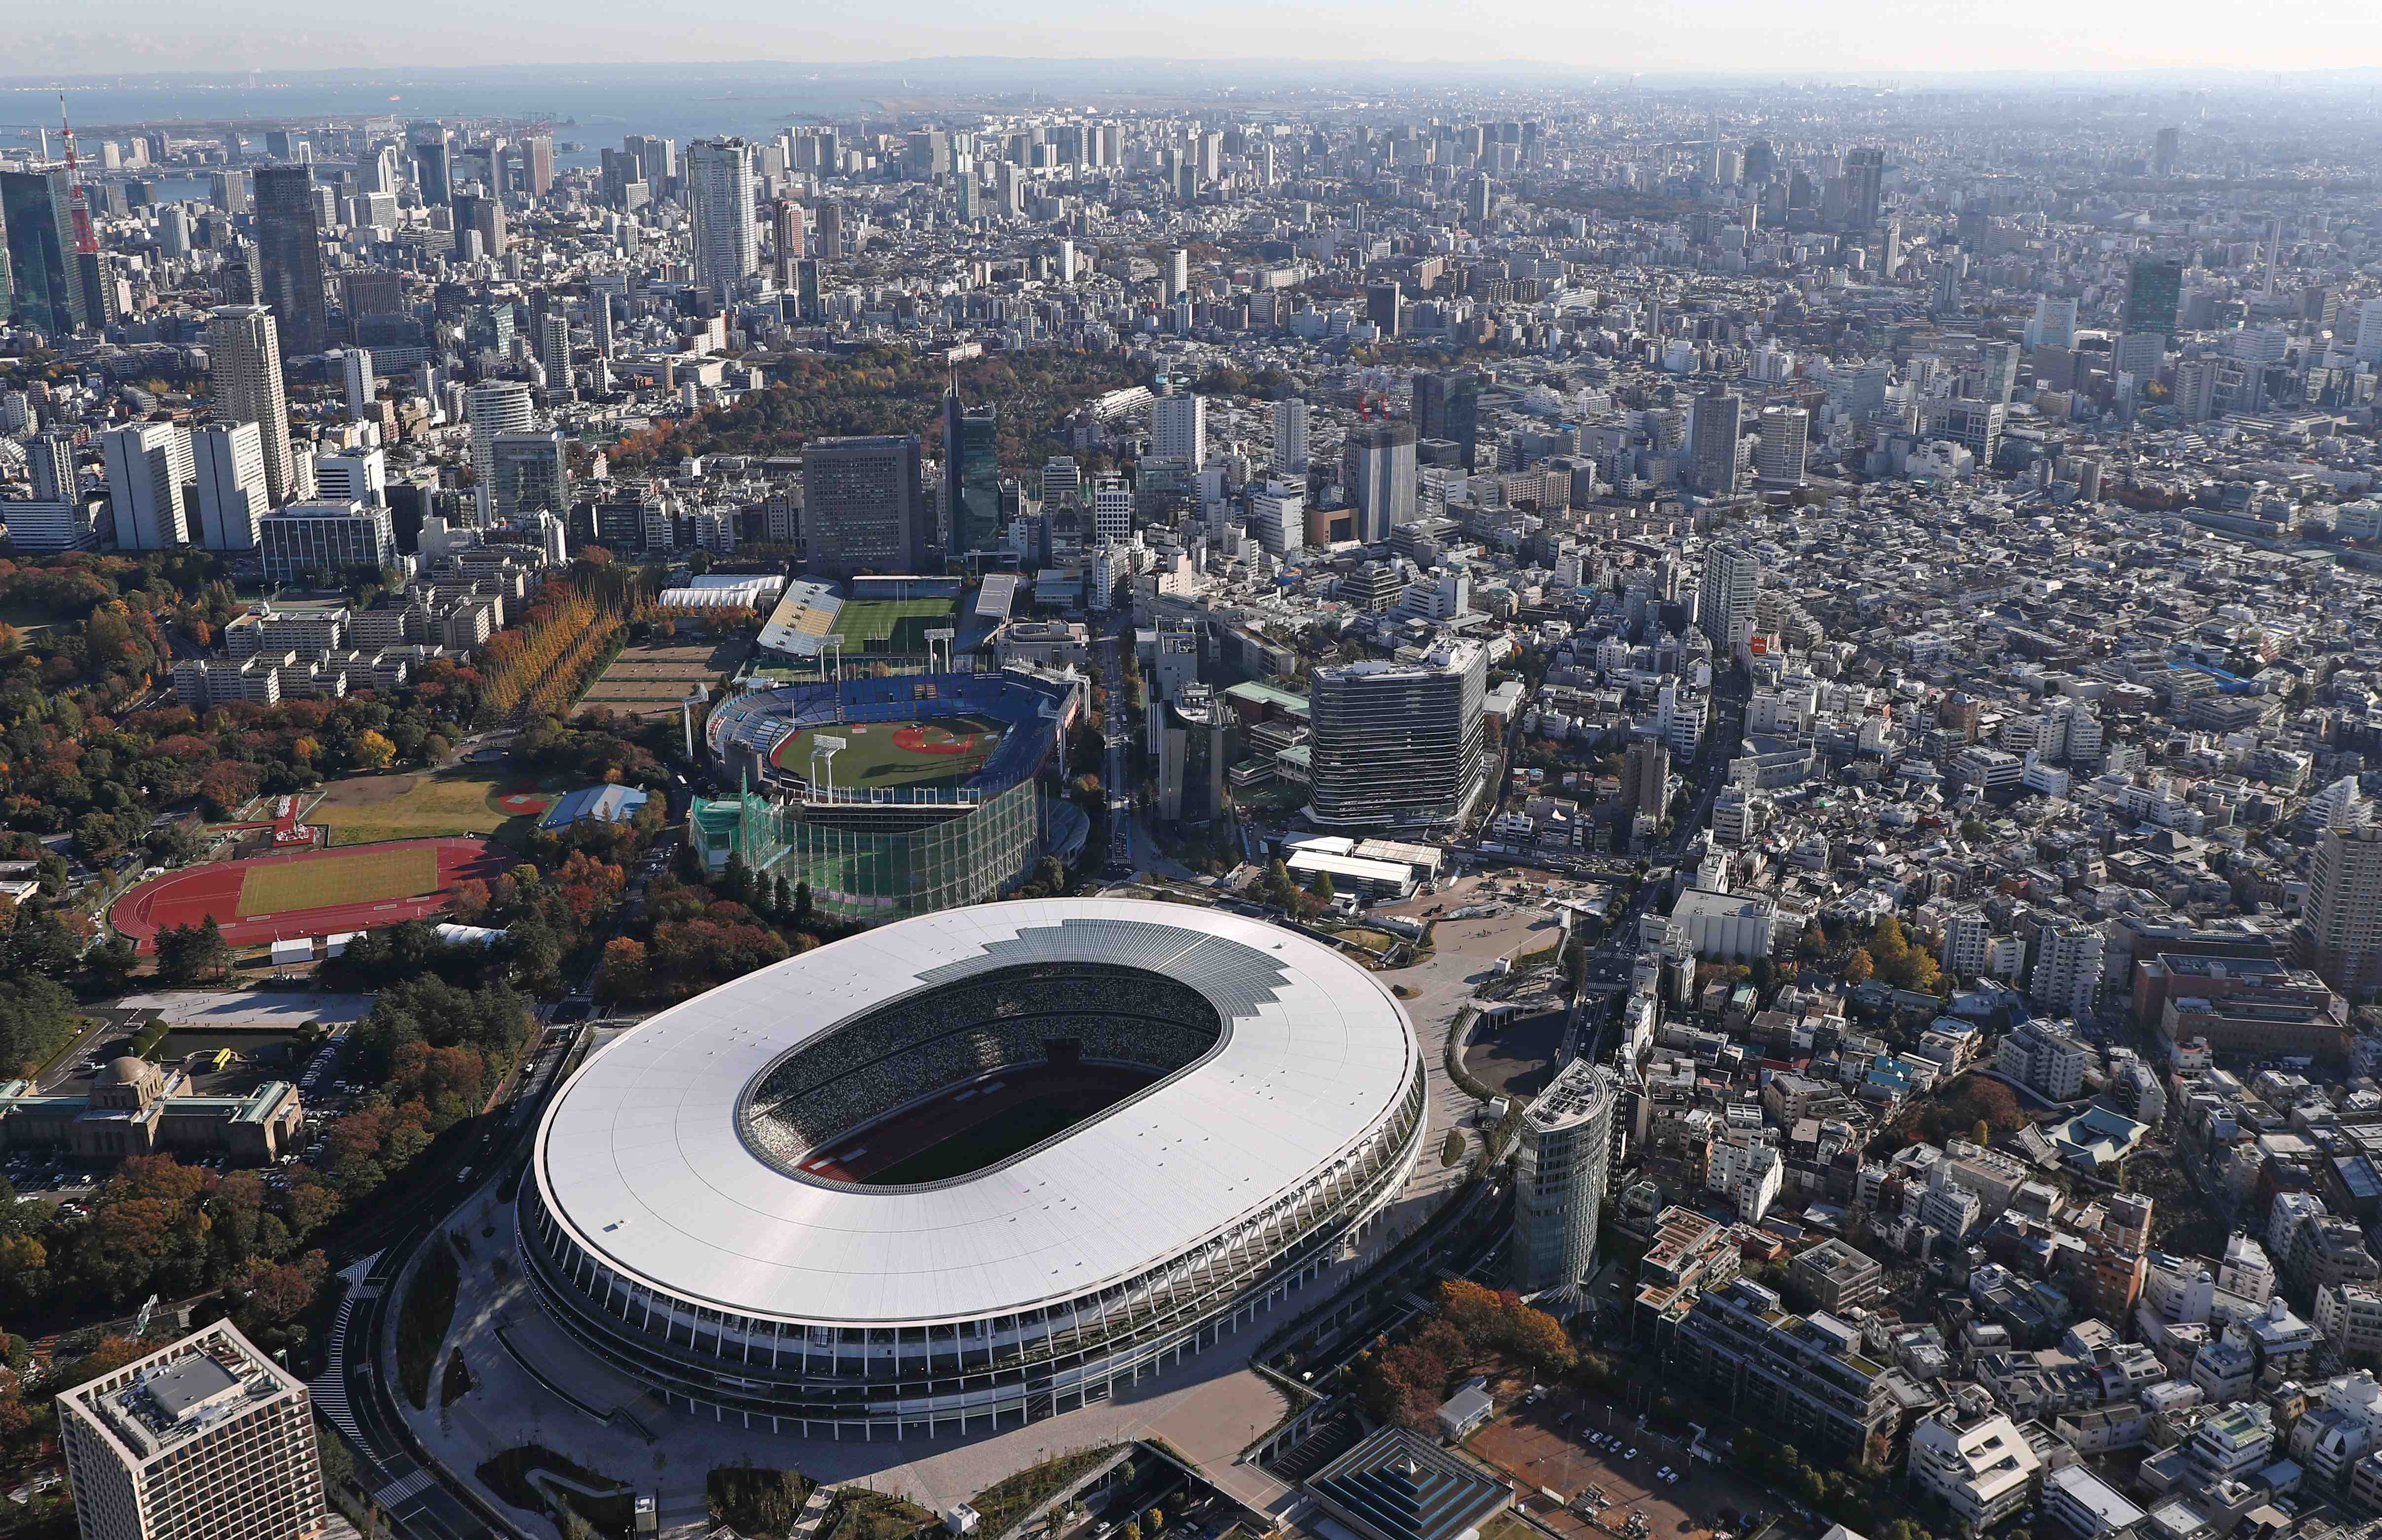 Japan New National Stadium Tokyo Olympics 2020 036